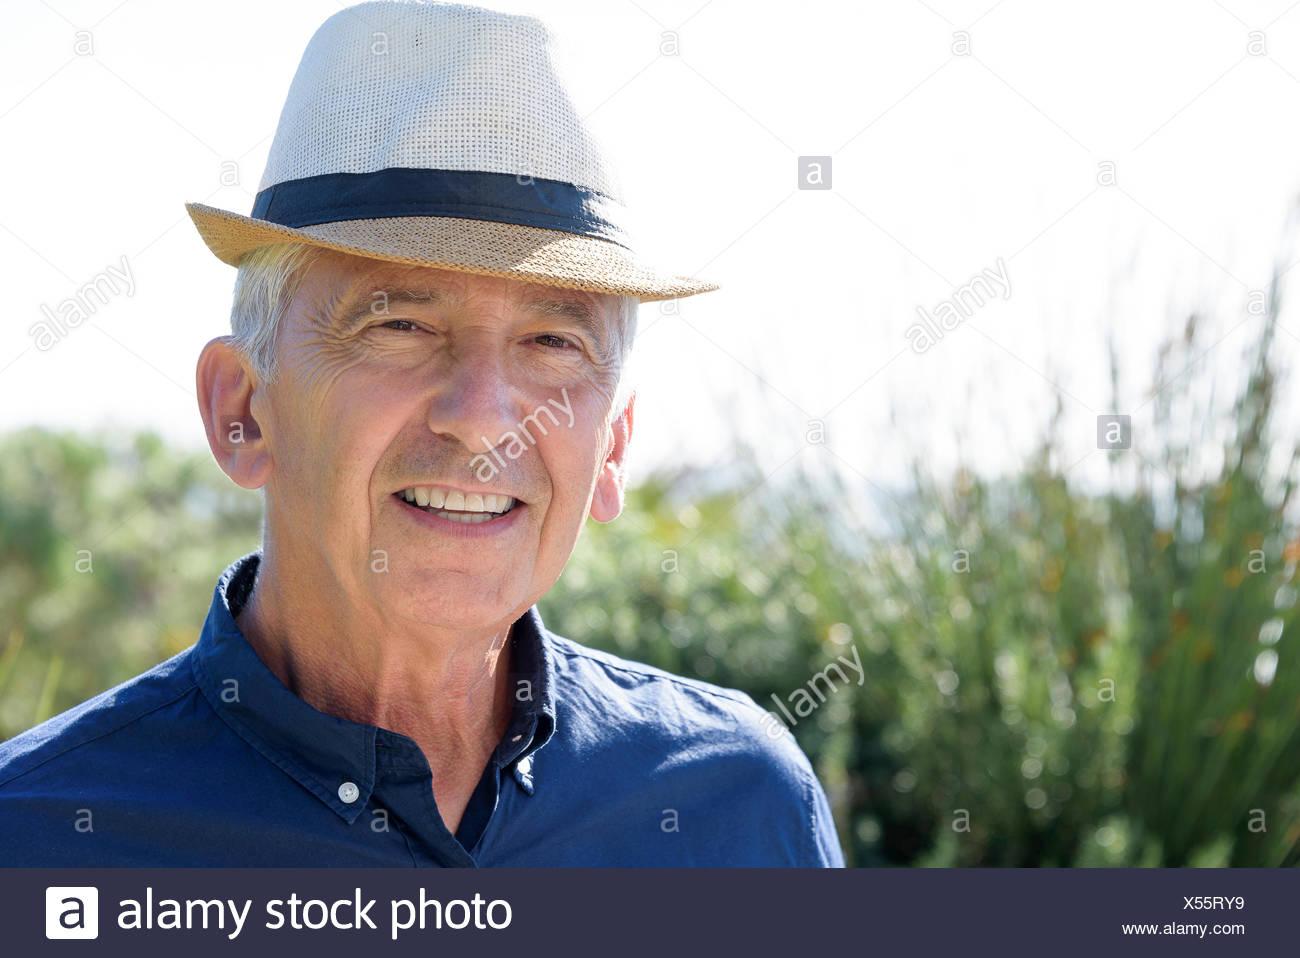 Portrait of a happy senior man smiling - Stock Image